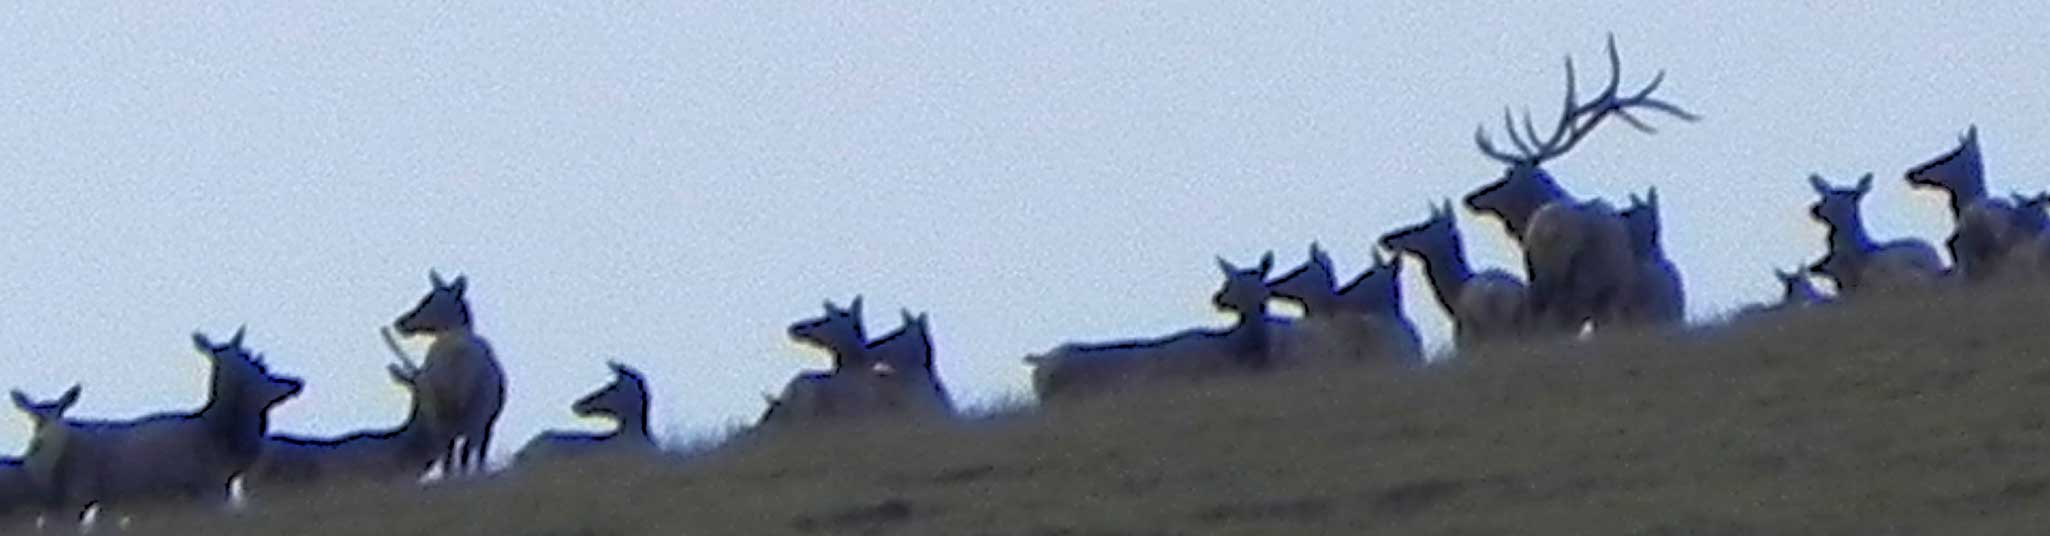 elkhunting